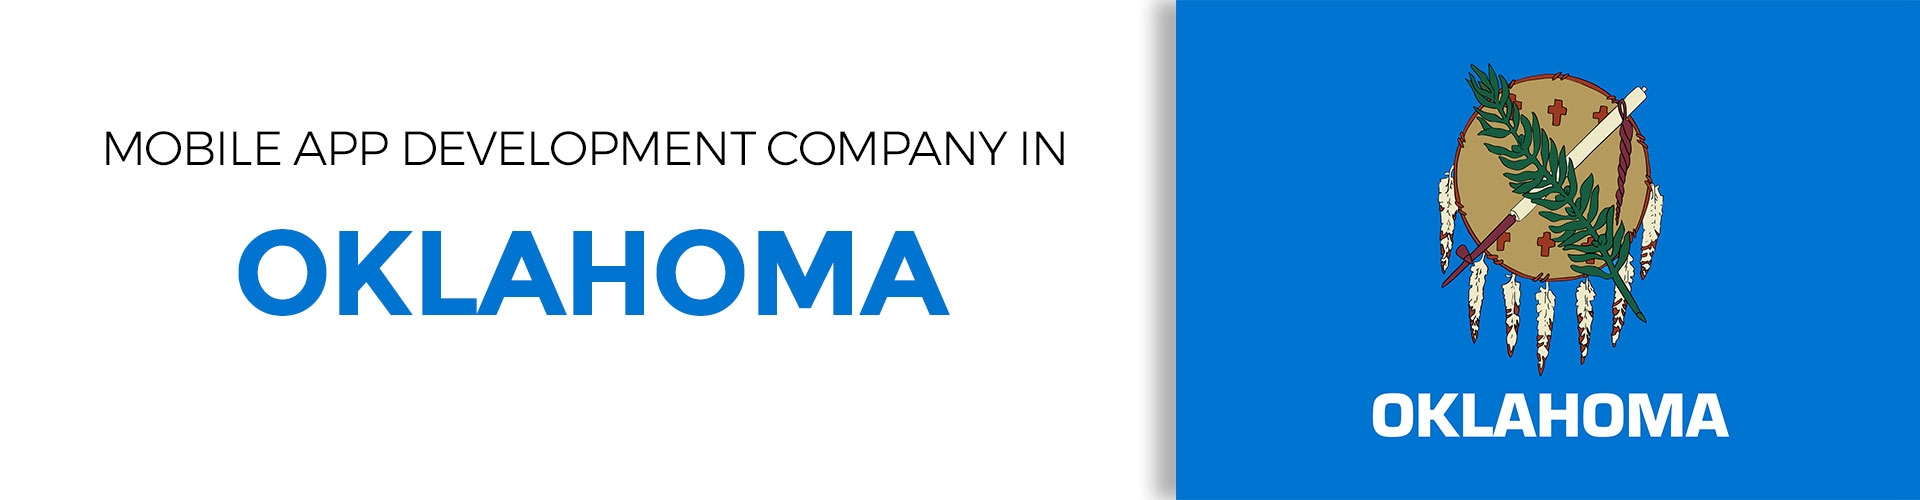 mobile app development company oklahoma